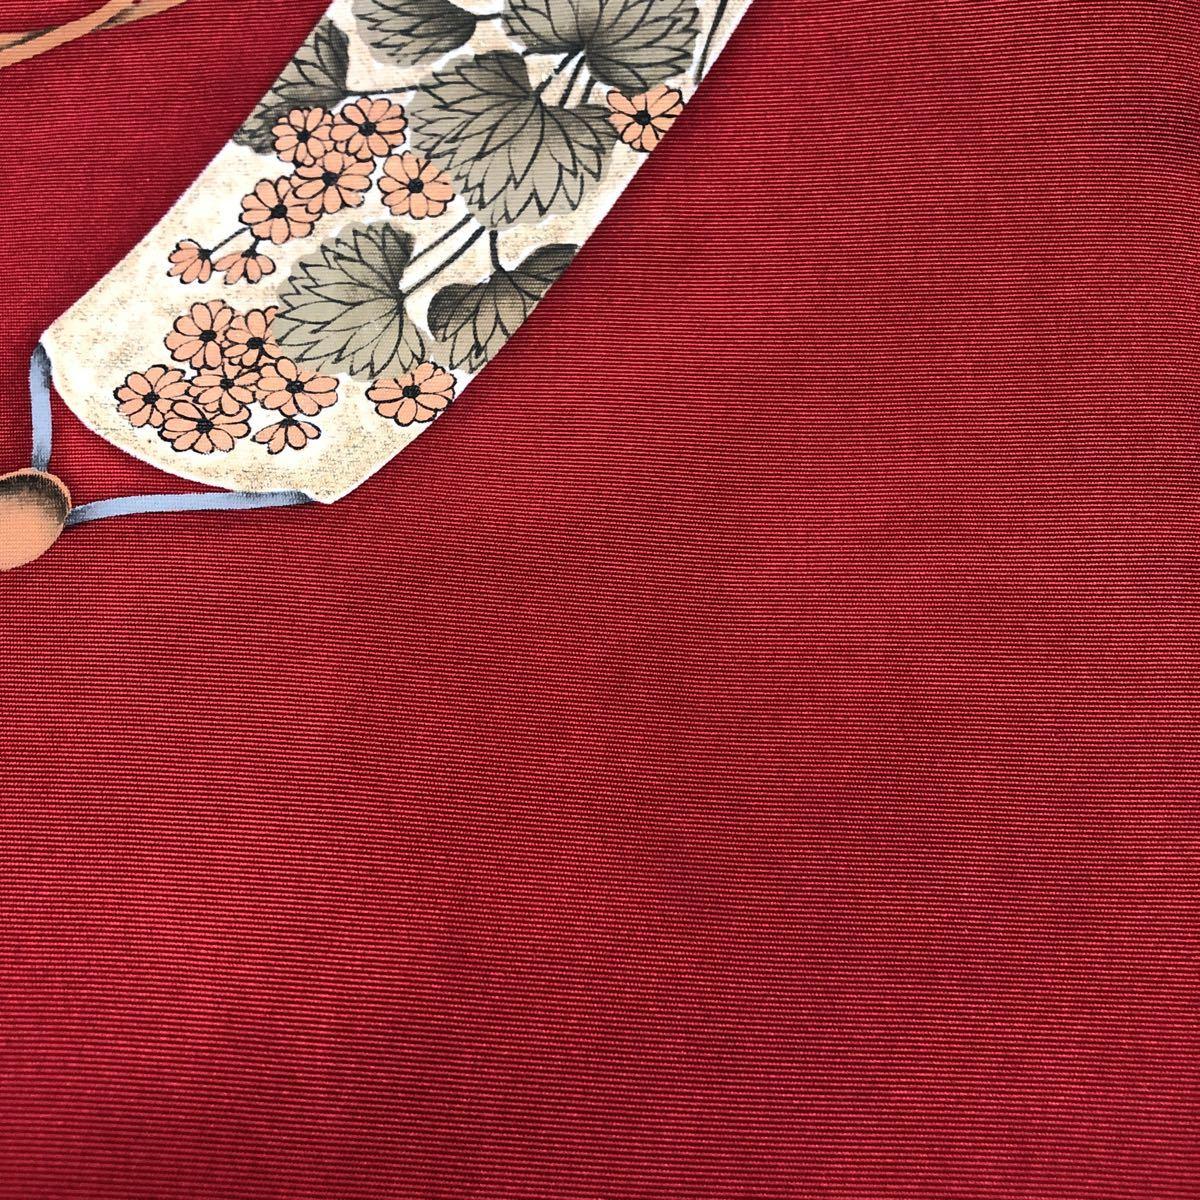 送料無料☆ウサギ柄正絹名古屋帯   和装  着物帯♪リメイク 手芸素材約巾     約_画像4